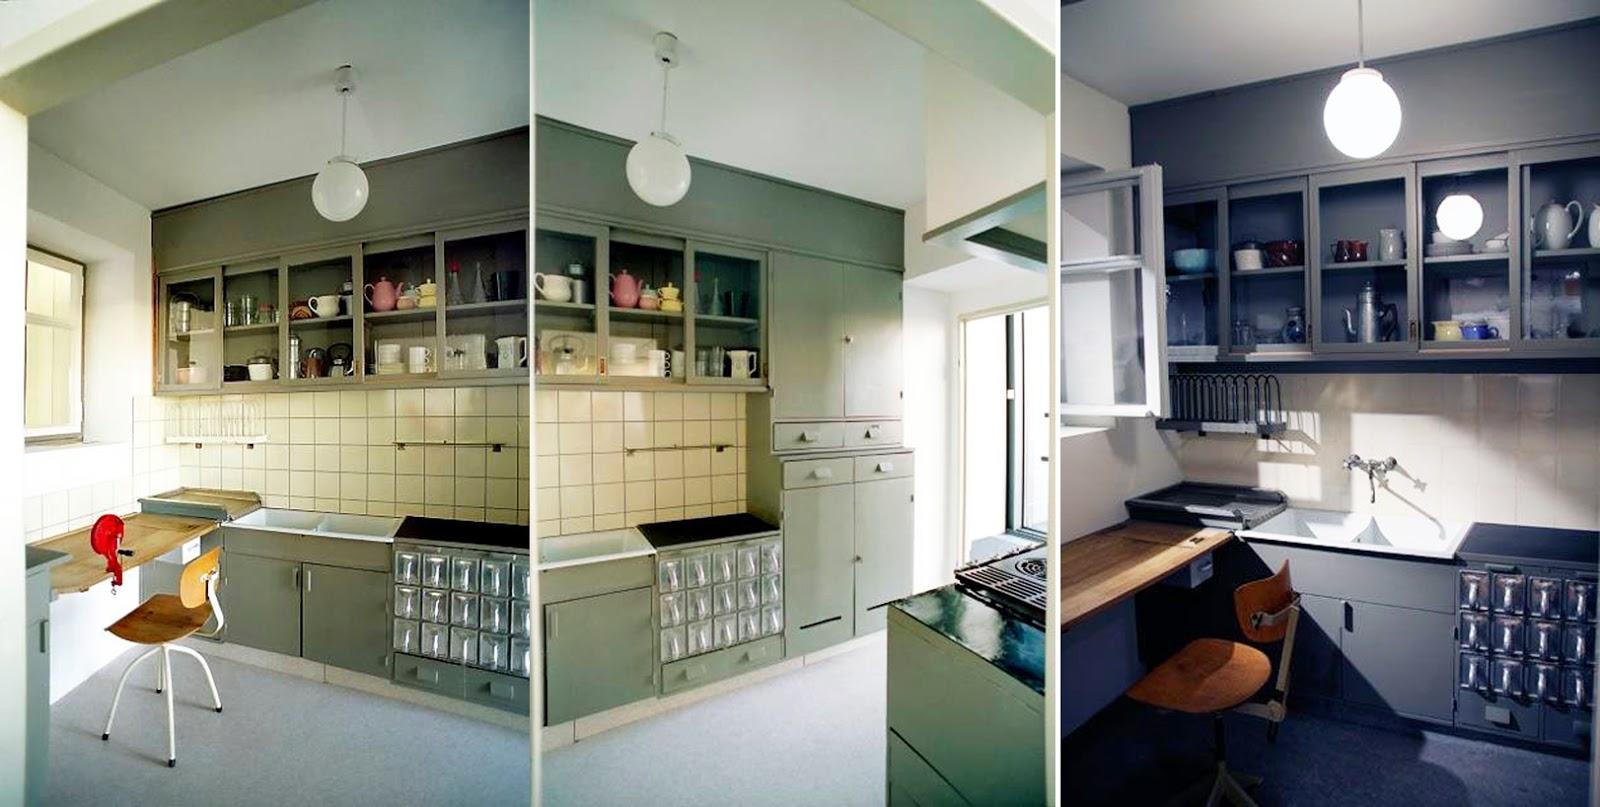 Kuchnia Prababka Czyli O Kuchni Frankfurckiej Design